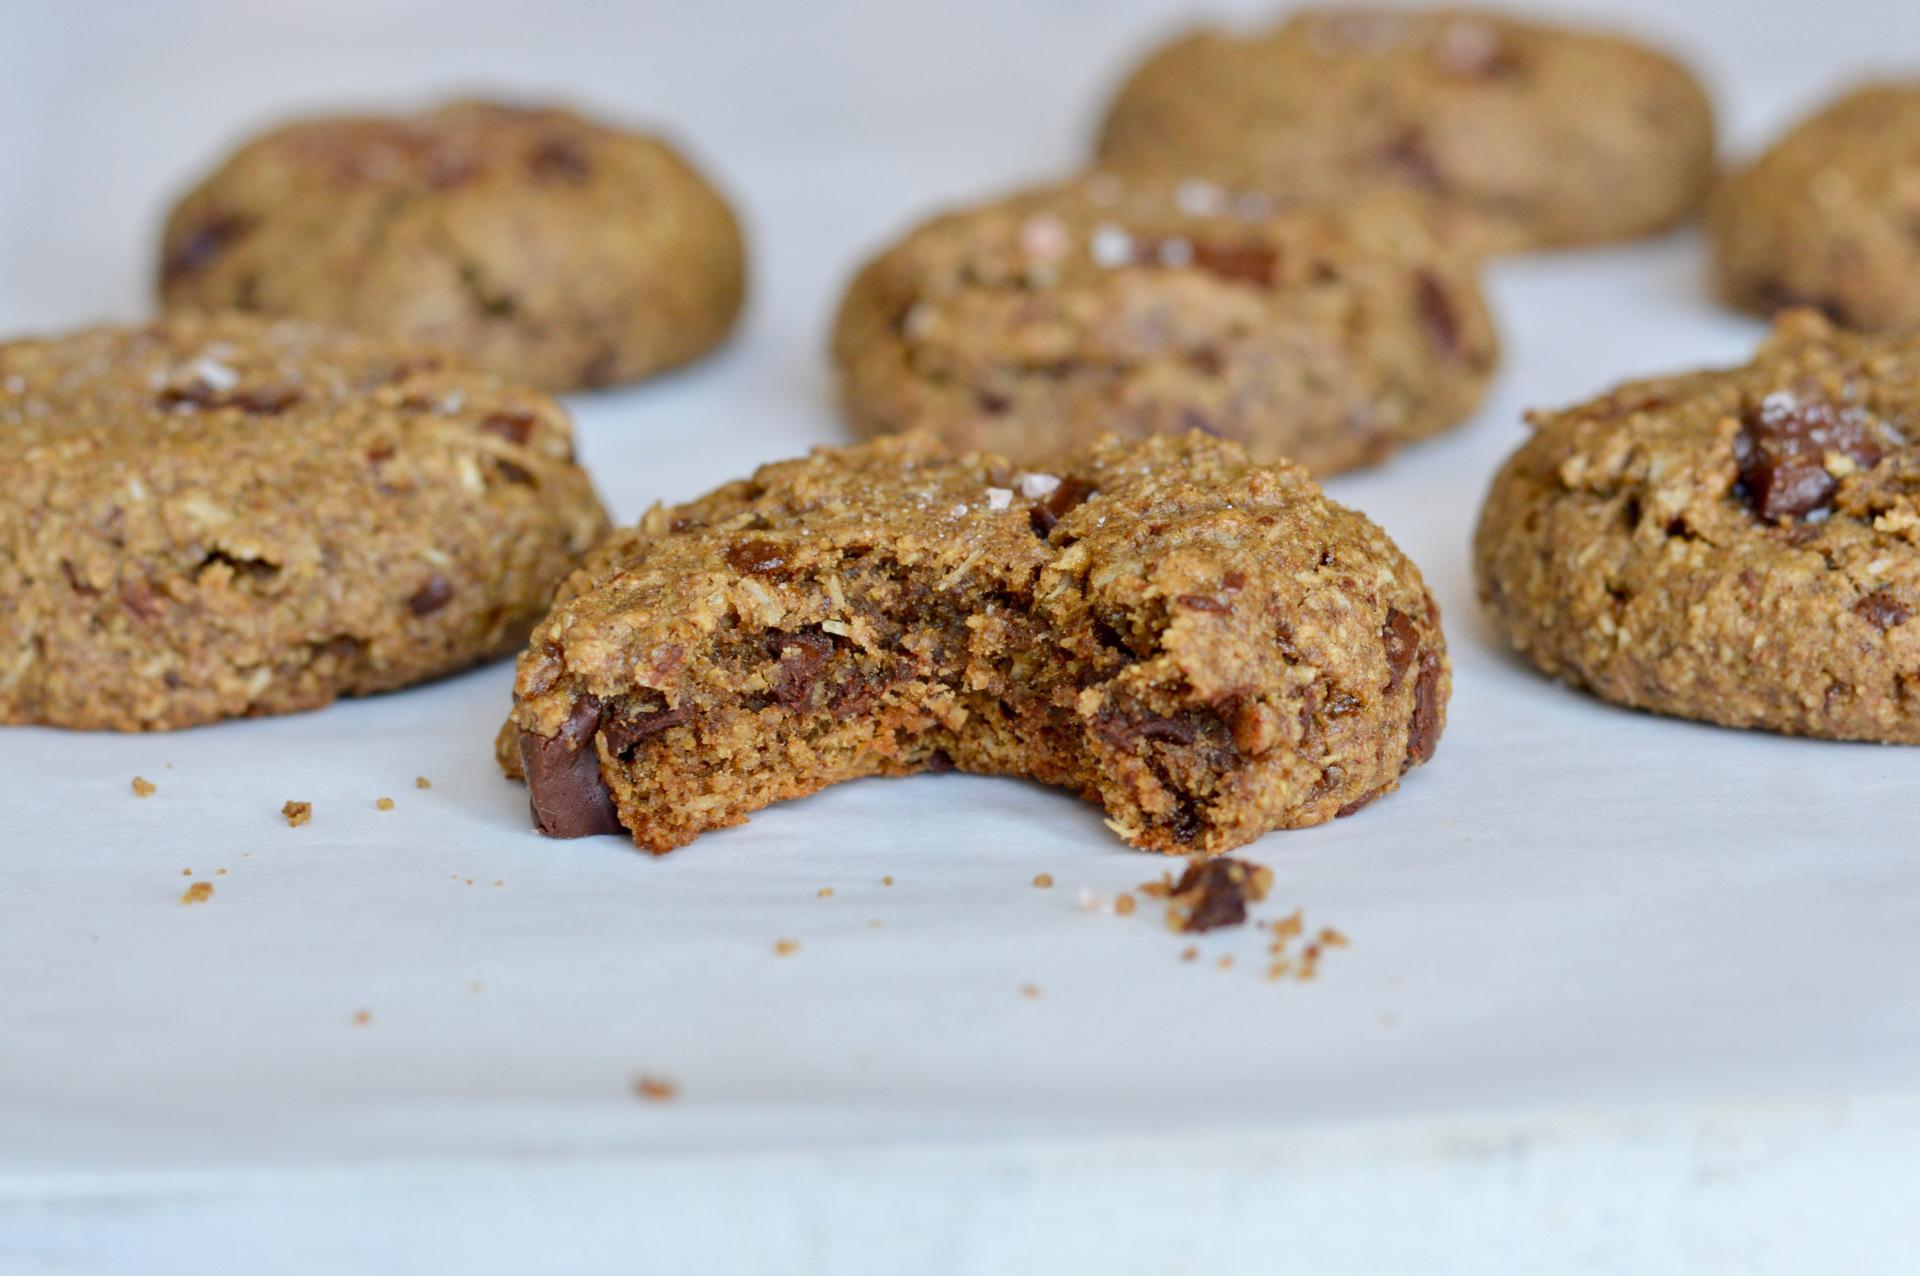 Gluten Free Chocolate Chunk Cookies [Vegan]